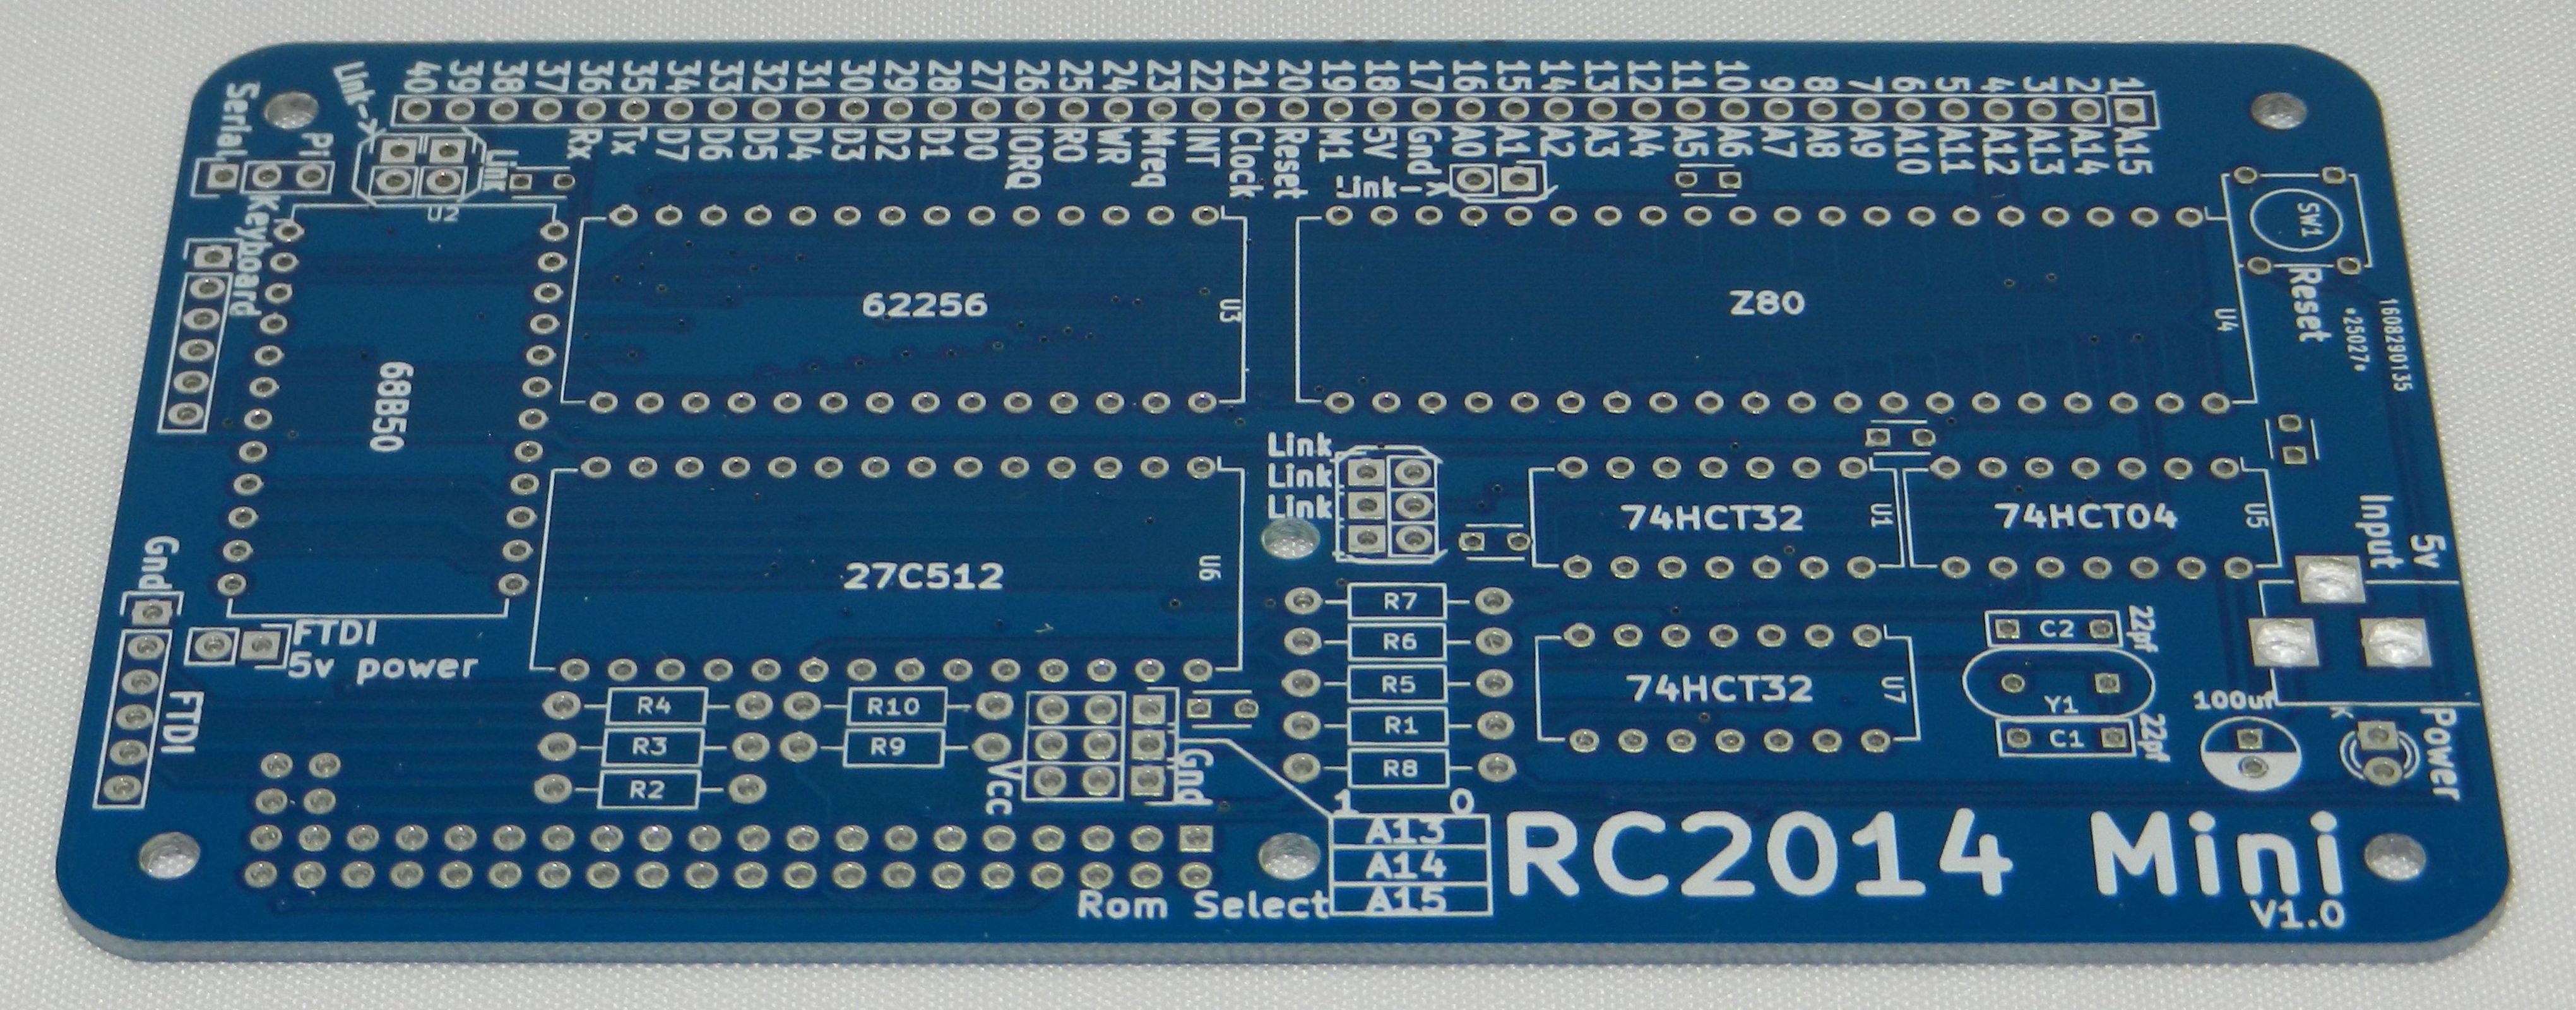 Rc2014 Mini 10 Pcb From Rfc2795 Ltd On Tindie Prototype Printed Circuit Board Breadboard Free Shipping 1